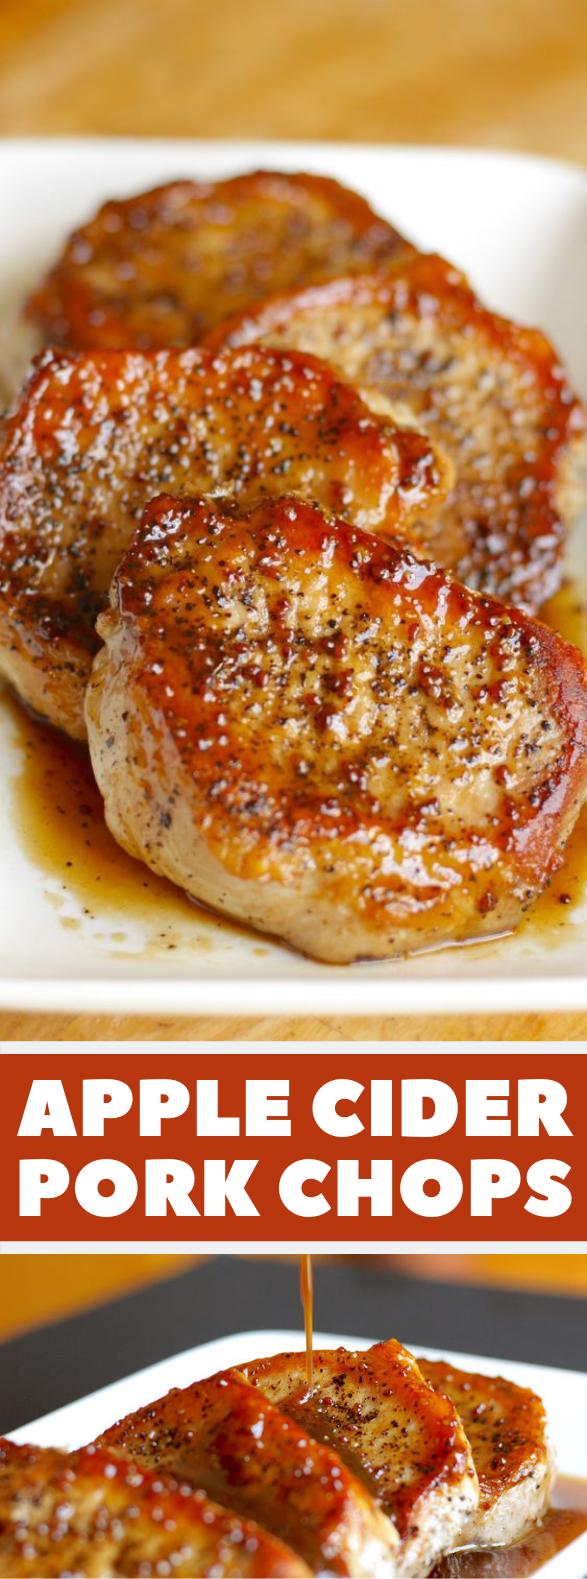 Apple Cider Pork Chops #Dinner #Recipes